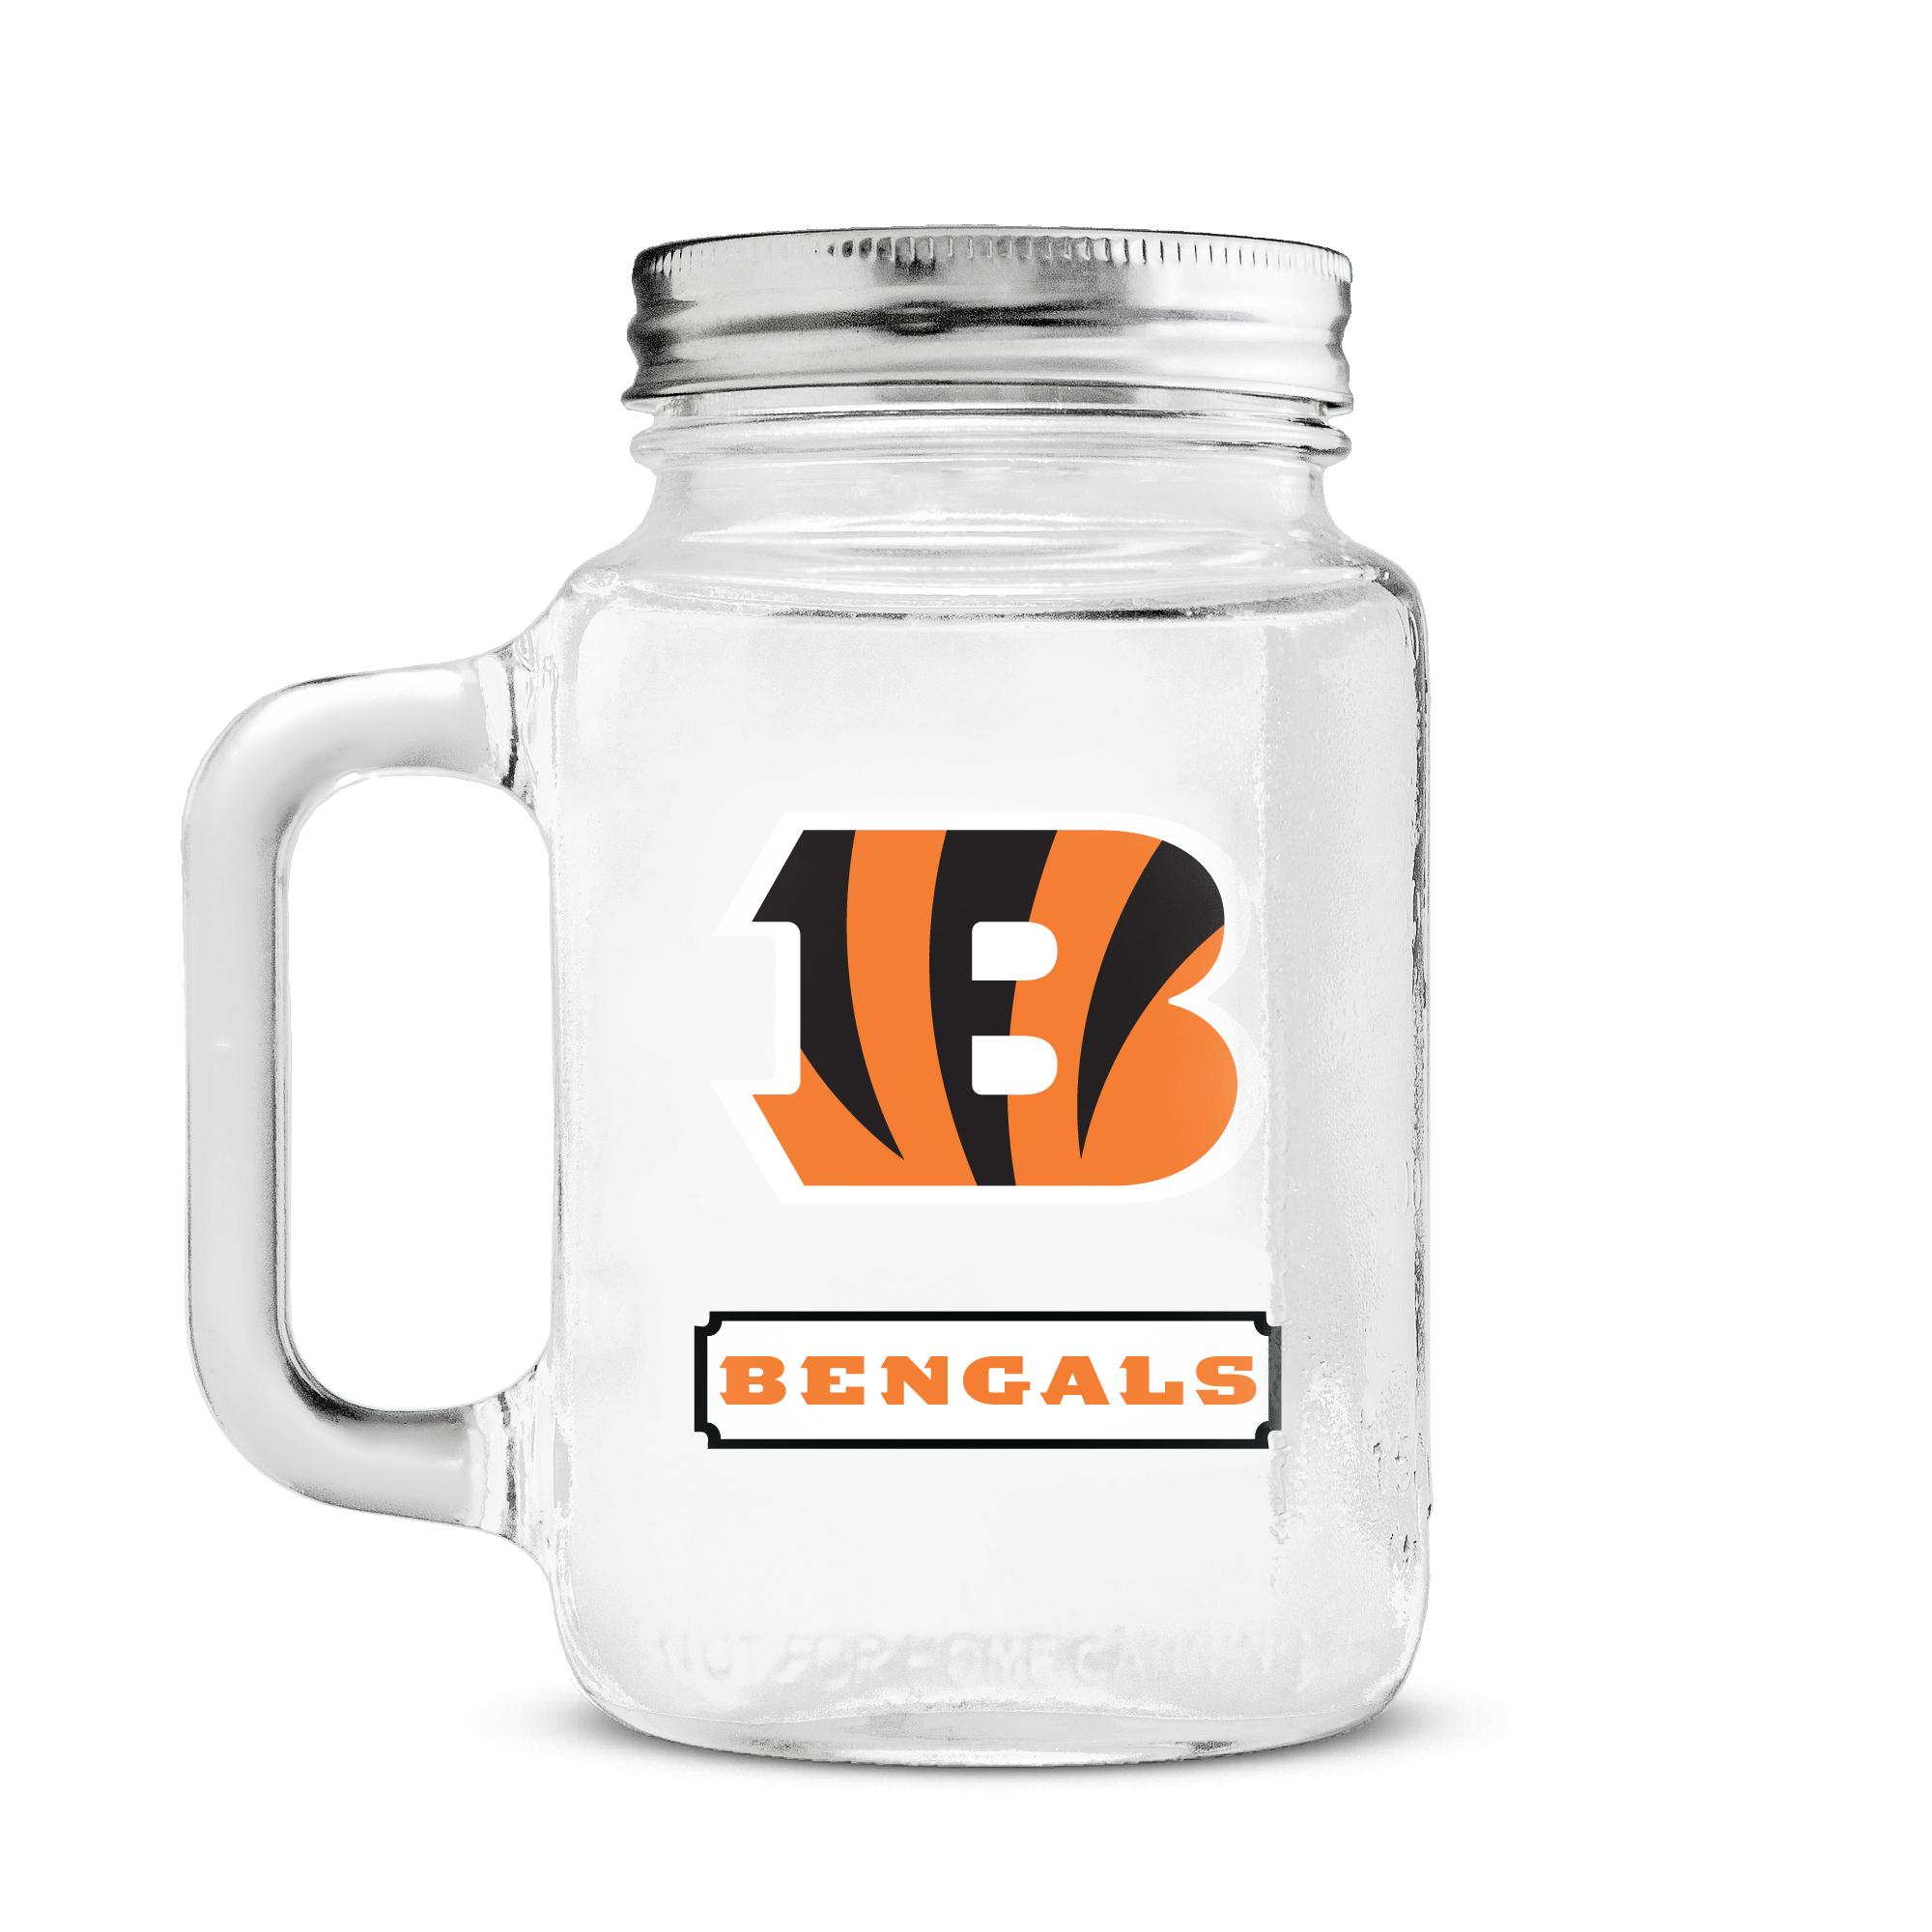 Duckhouse 16 Ounce Mason Jar - Cincinnati Bengals